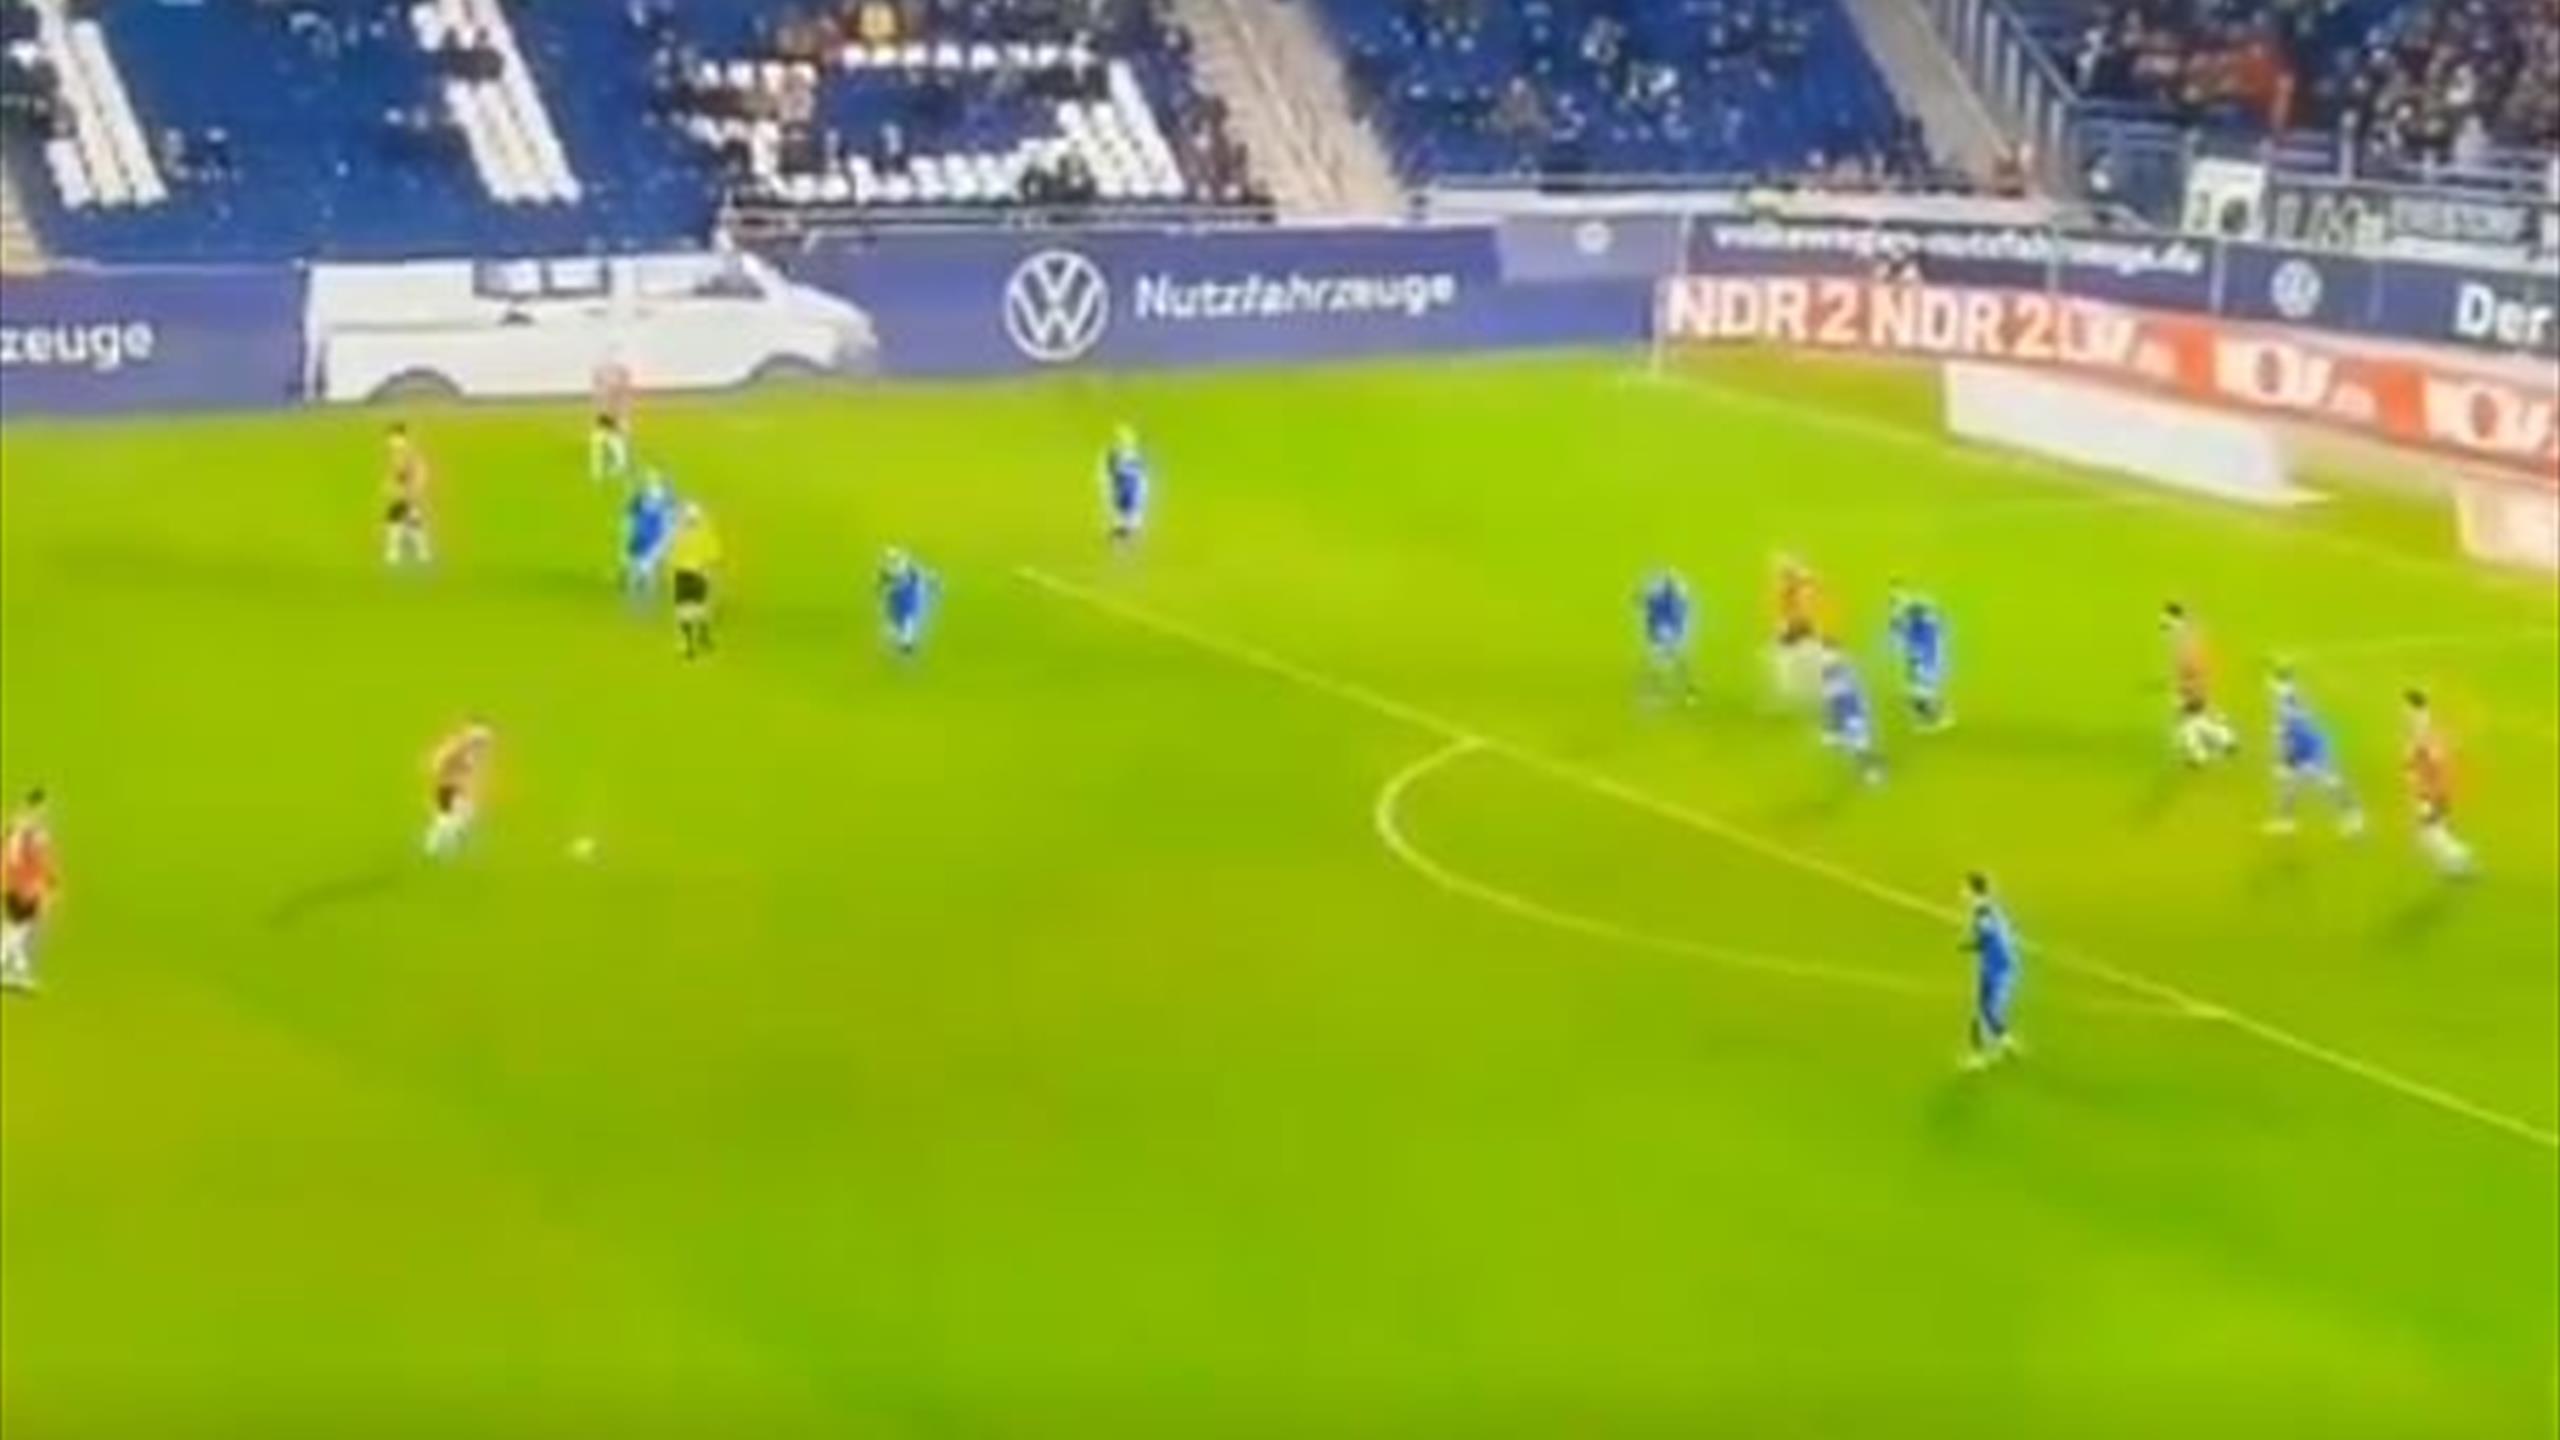 Чемпионат гемании 2- knuf по футболу